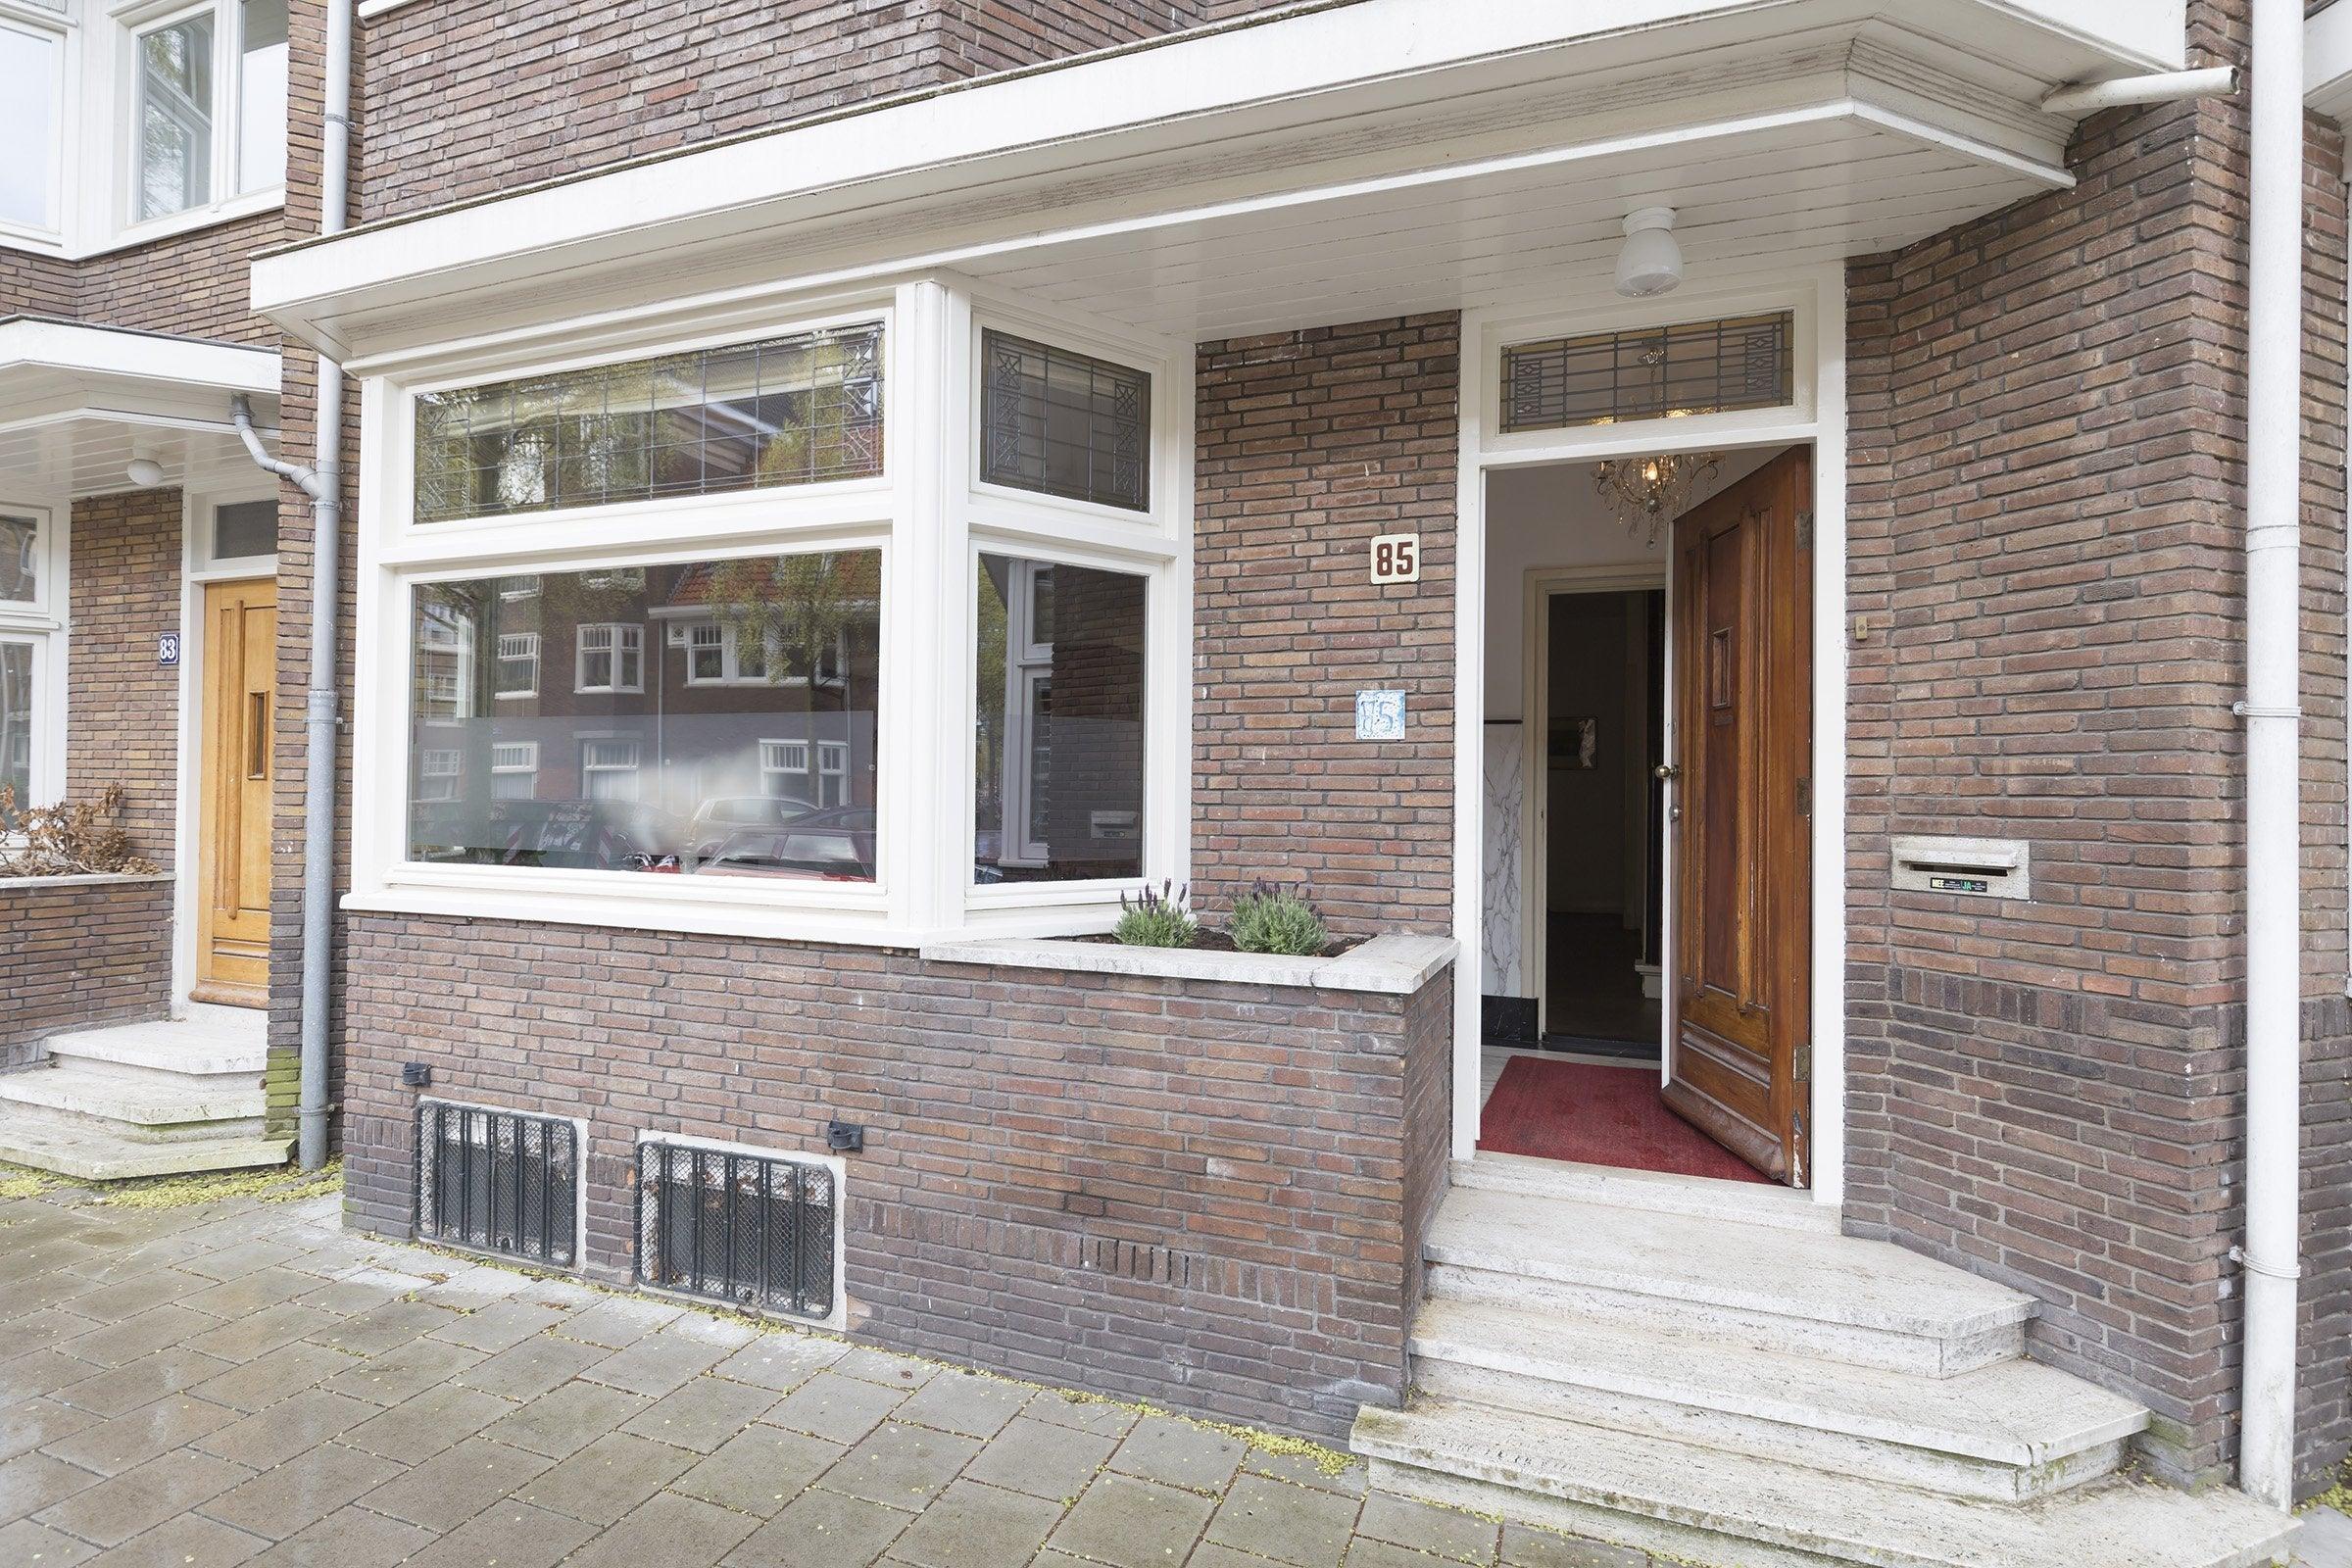 https://public.parariusoffice.nl/15/photos/huge/51221817.1494850006-267.jpg